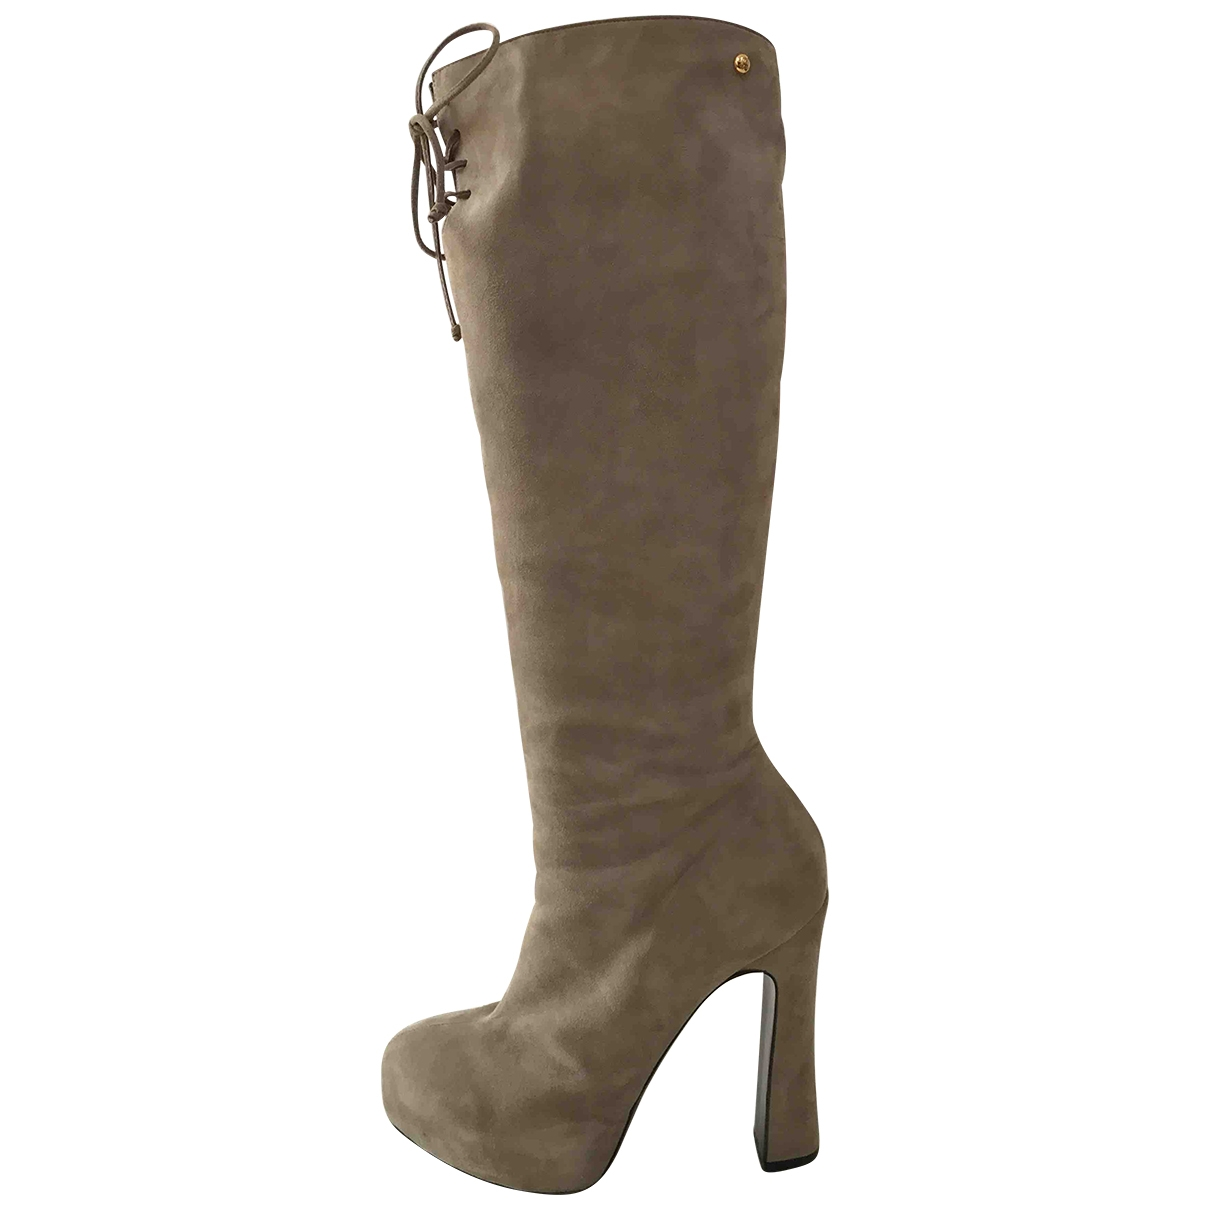 Just Cavalli \N Beige Suede Boots for Women 39 EU